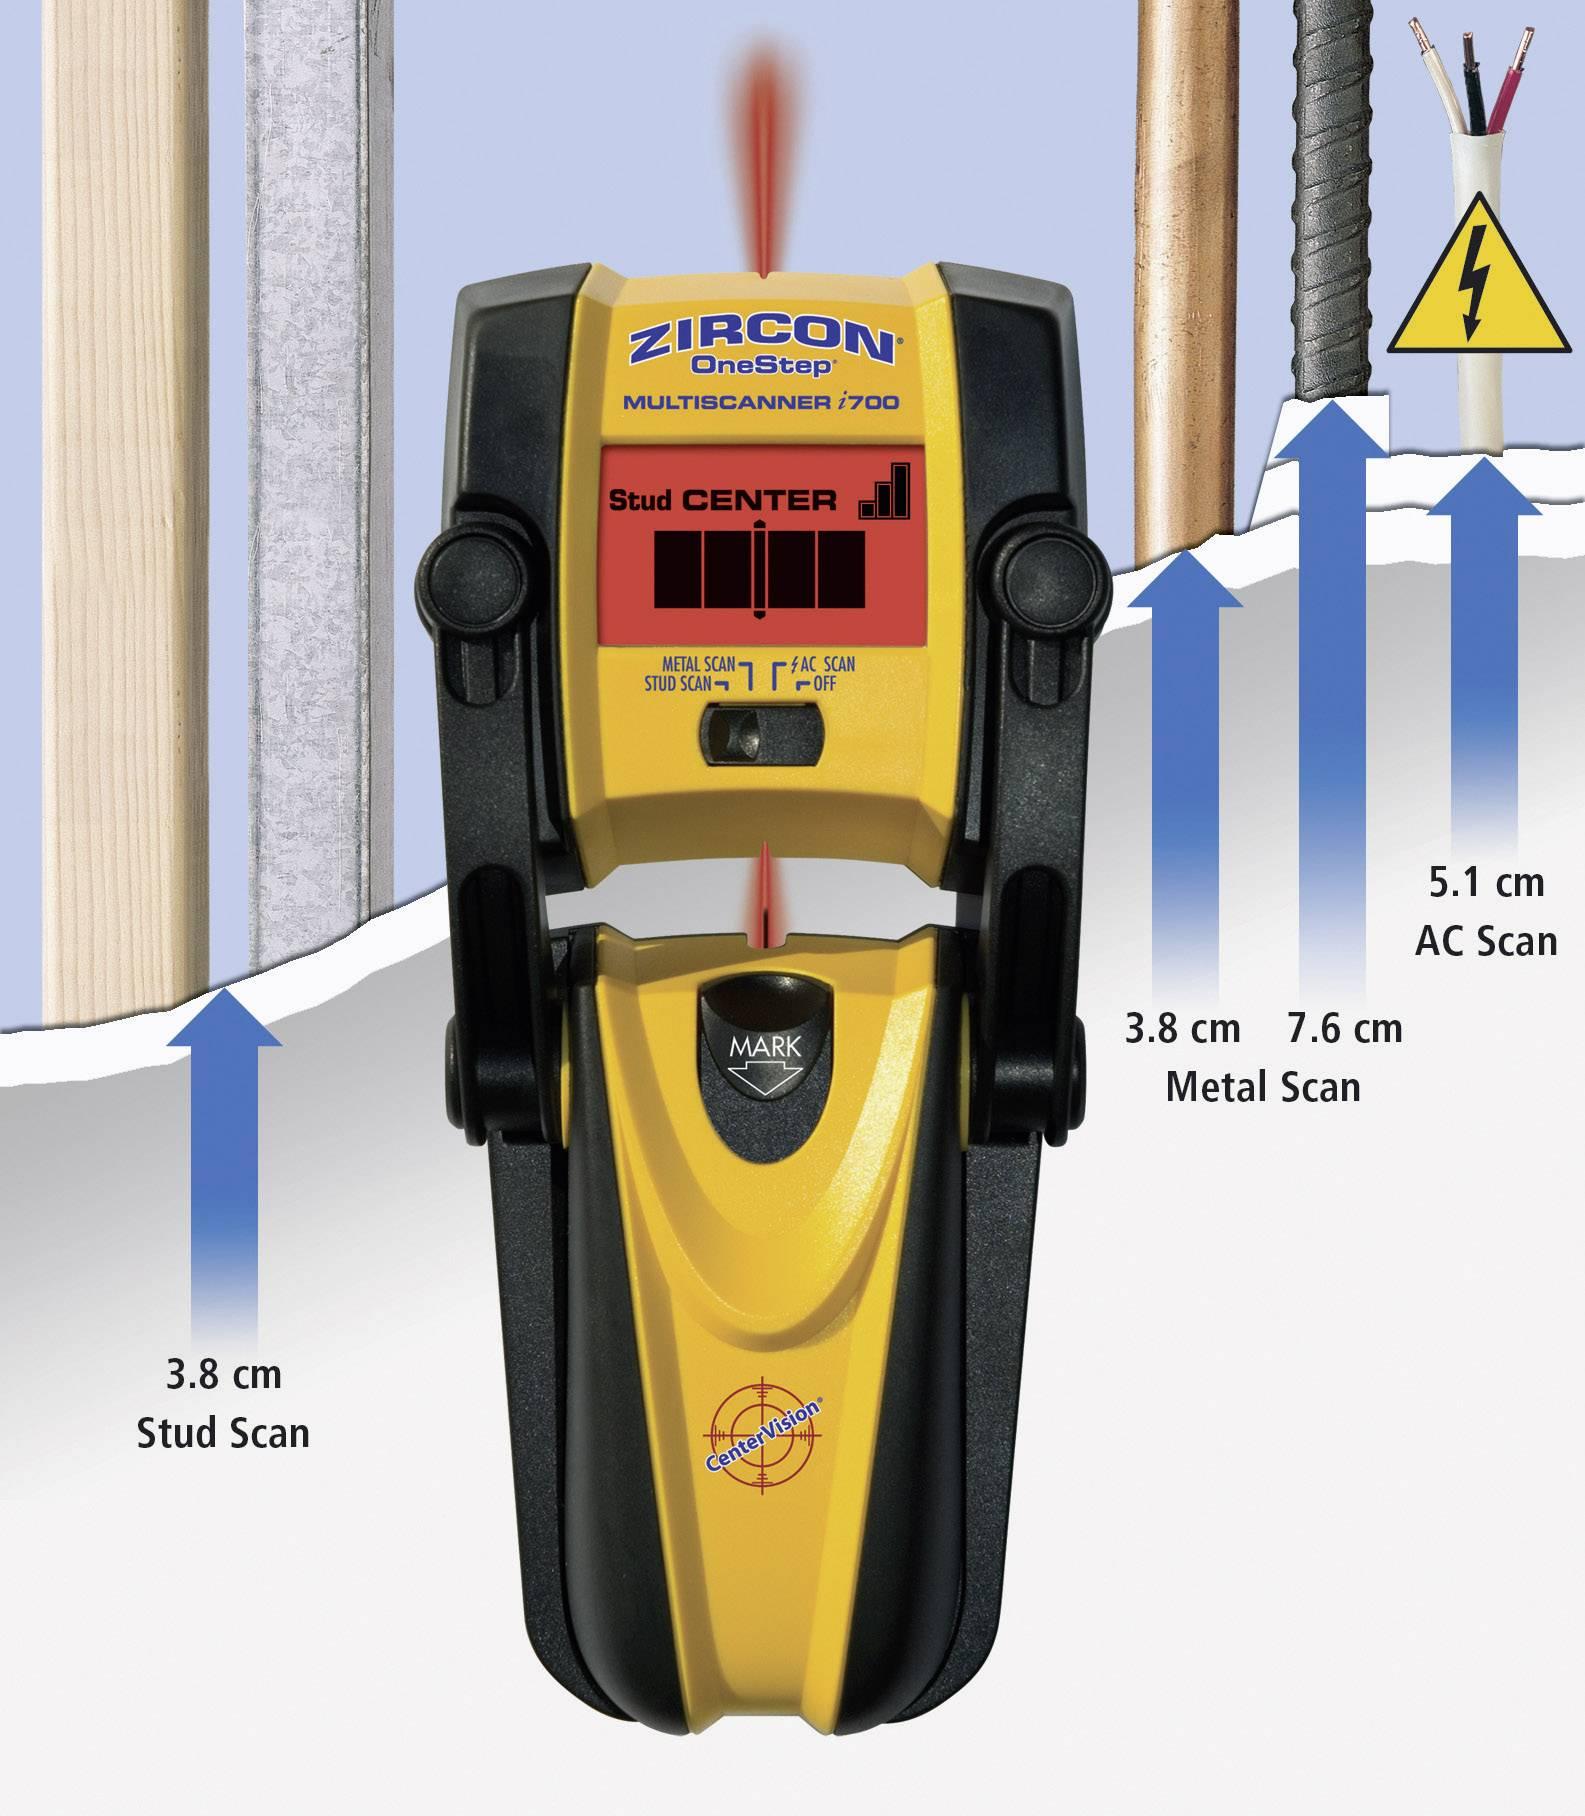 Detektor MultiScanner® Zircon i700 OneStept